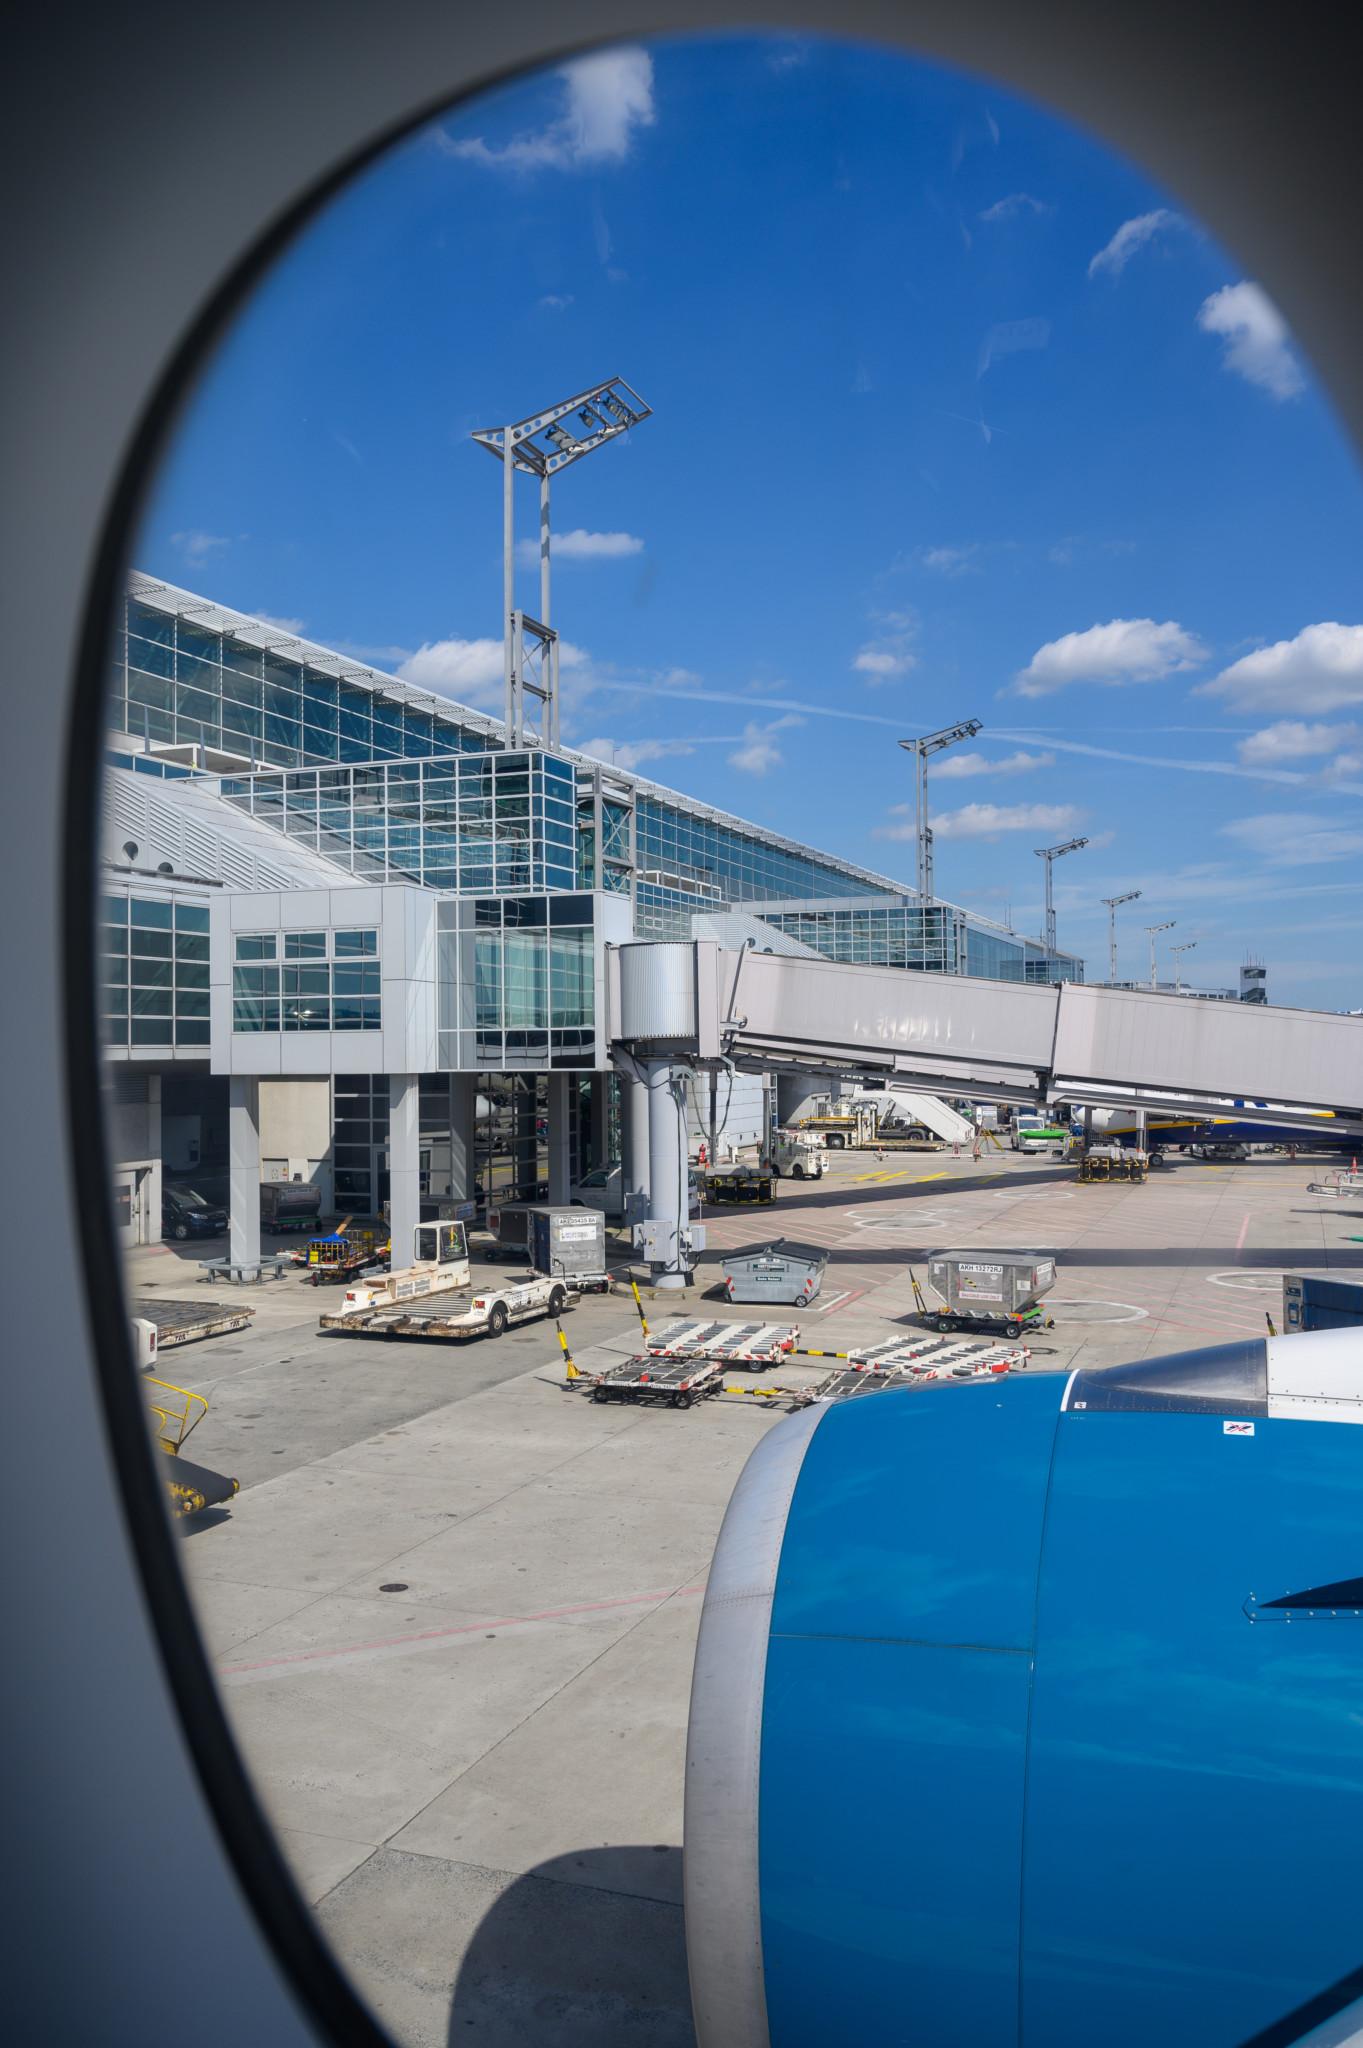 Vor dem Abflug in der Vietnam Airlines Premium Economy